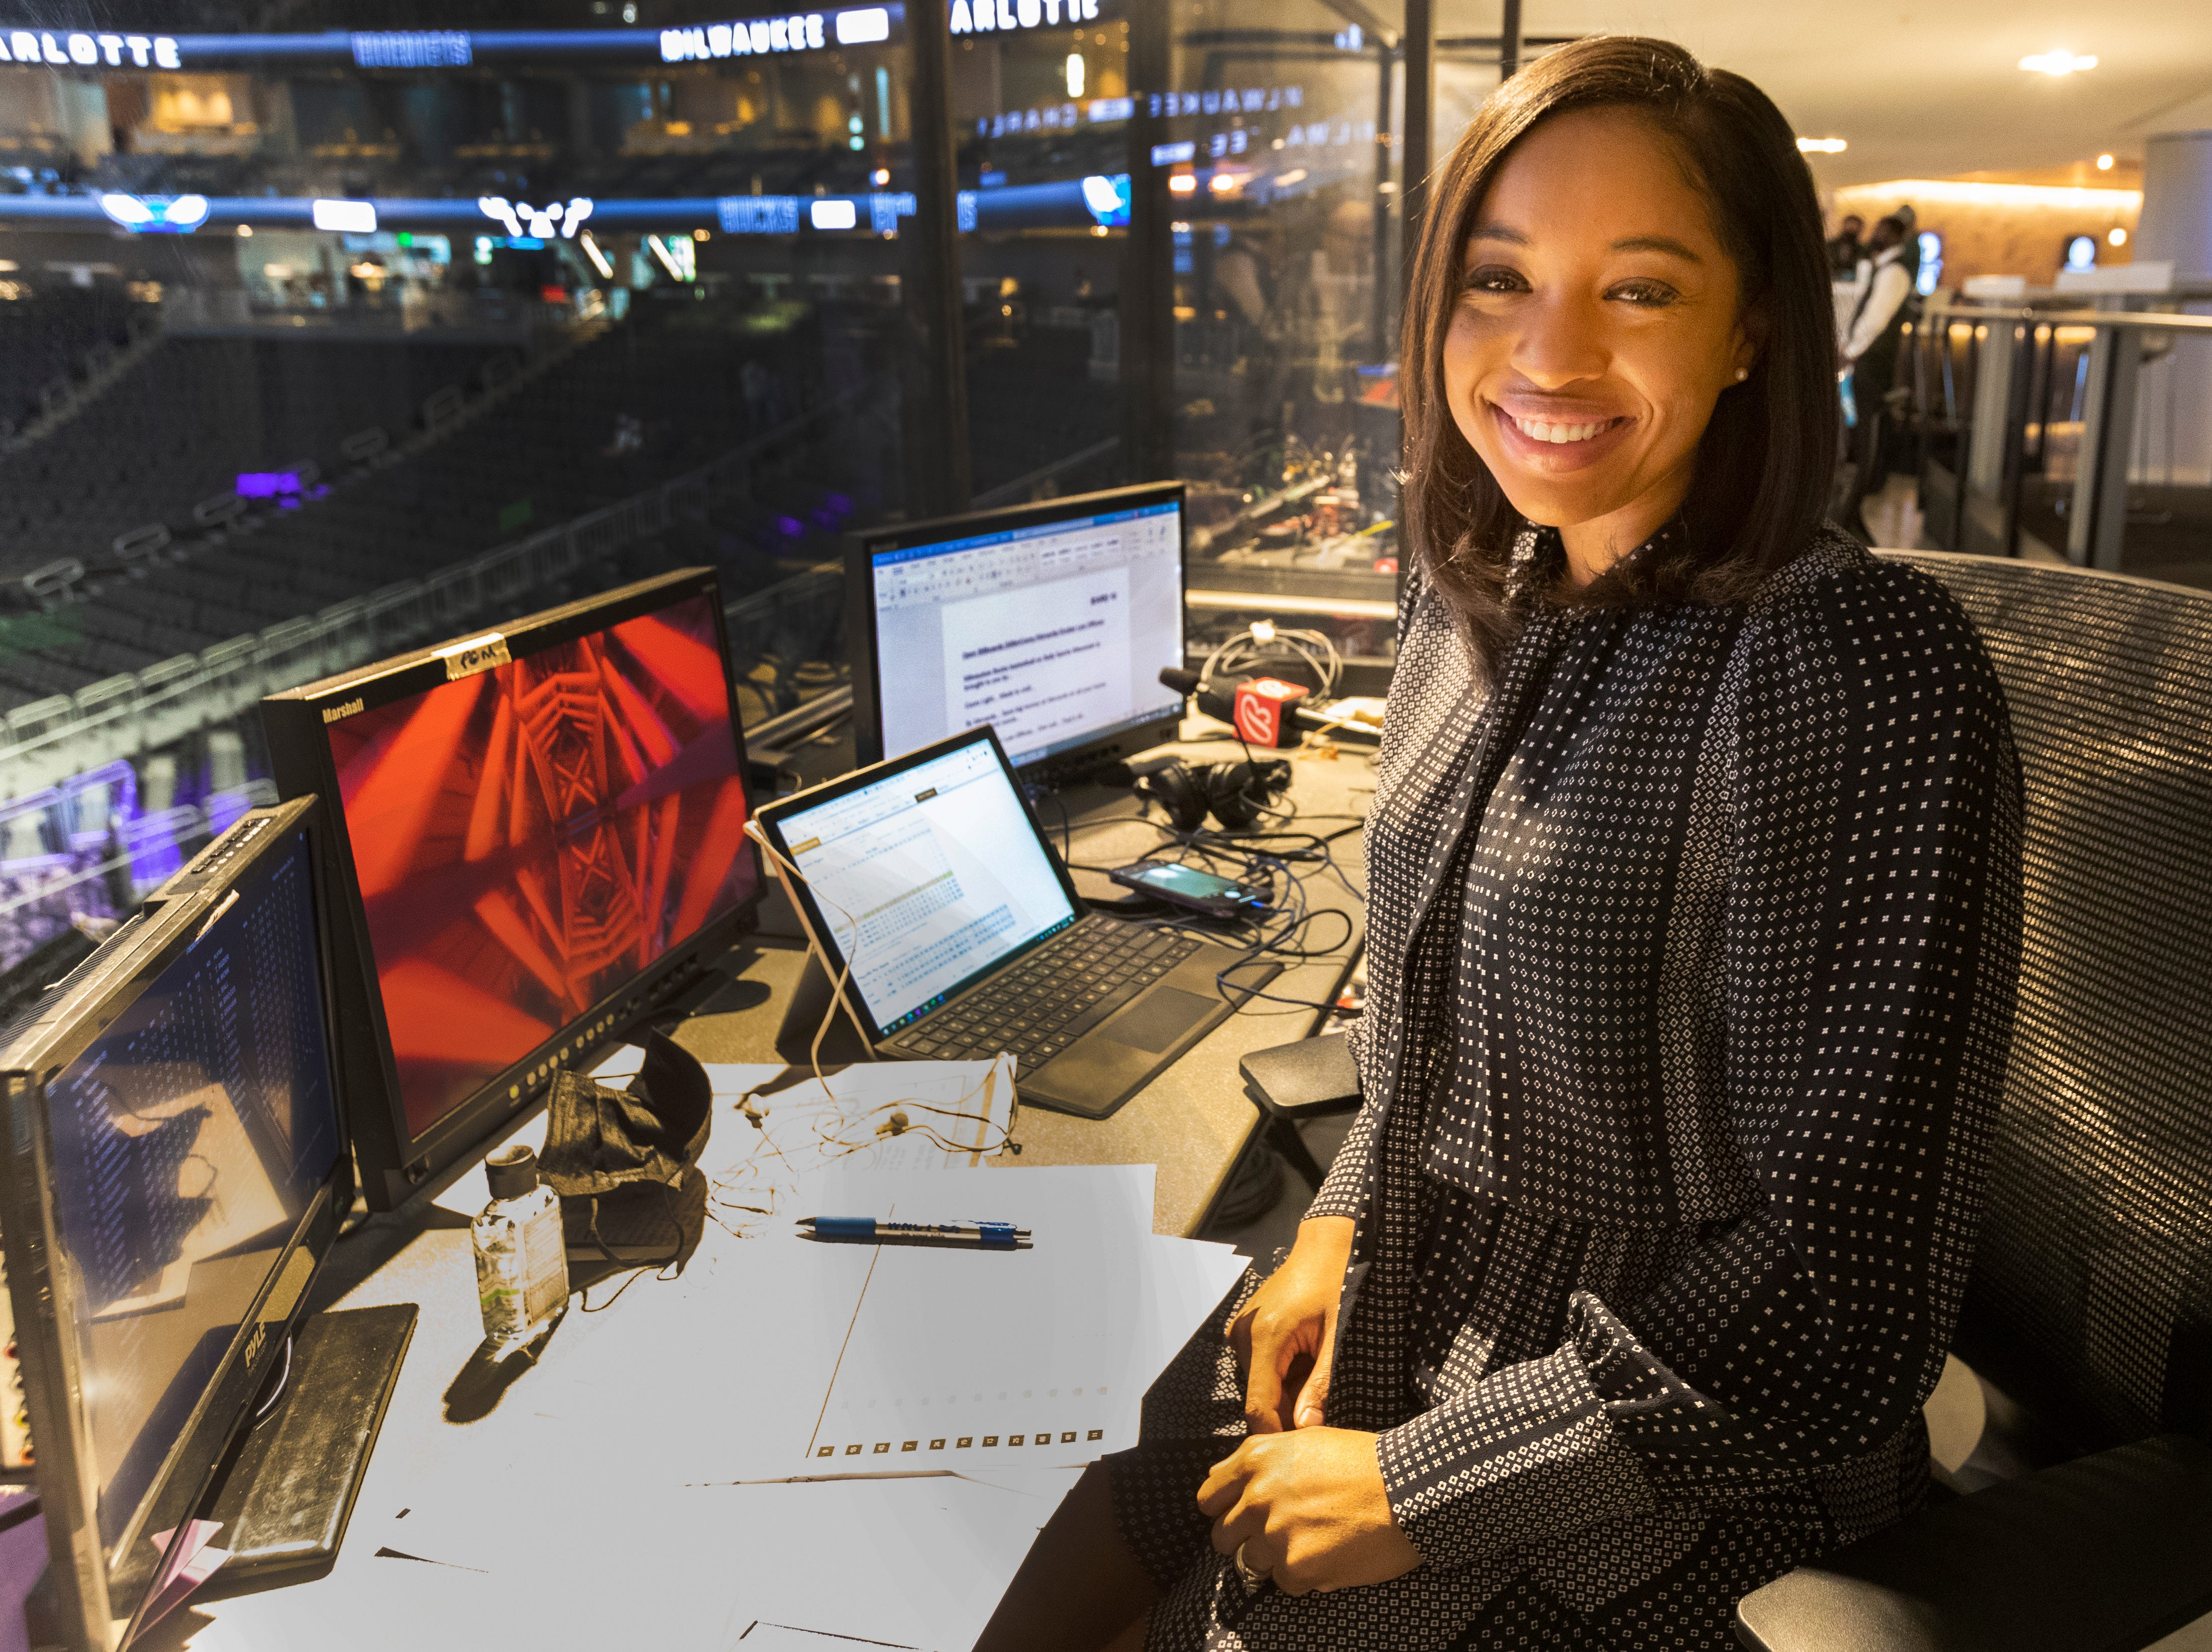 Bucks reporter Zora Stephenson to cover Olympic basketball for NBC